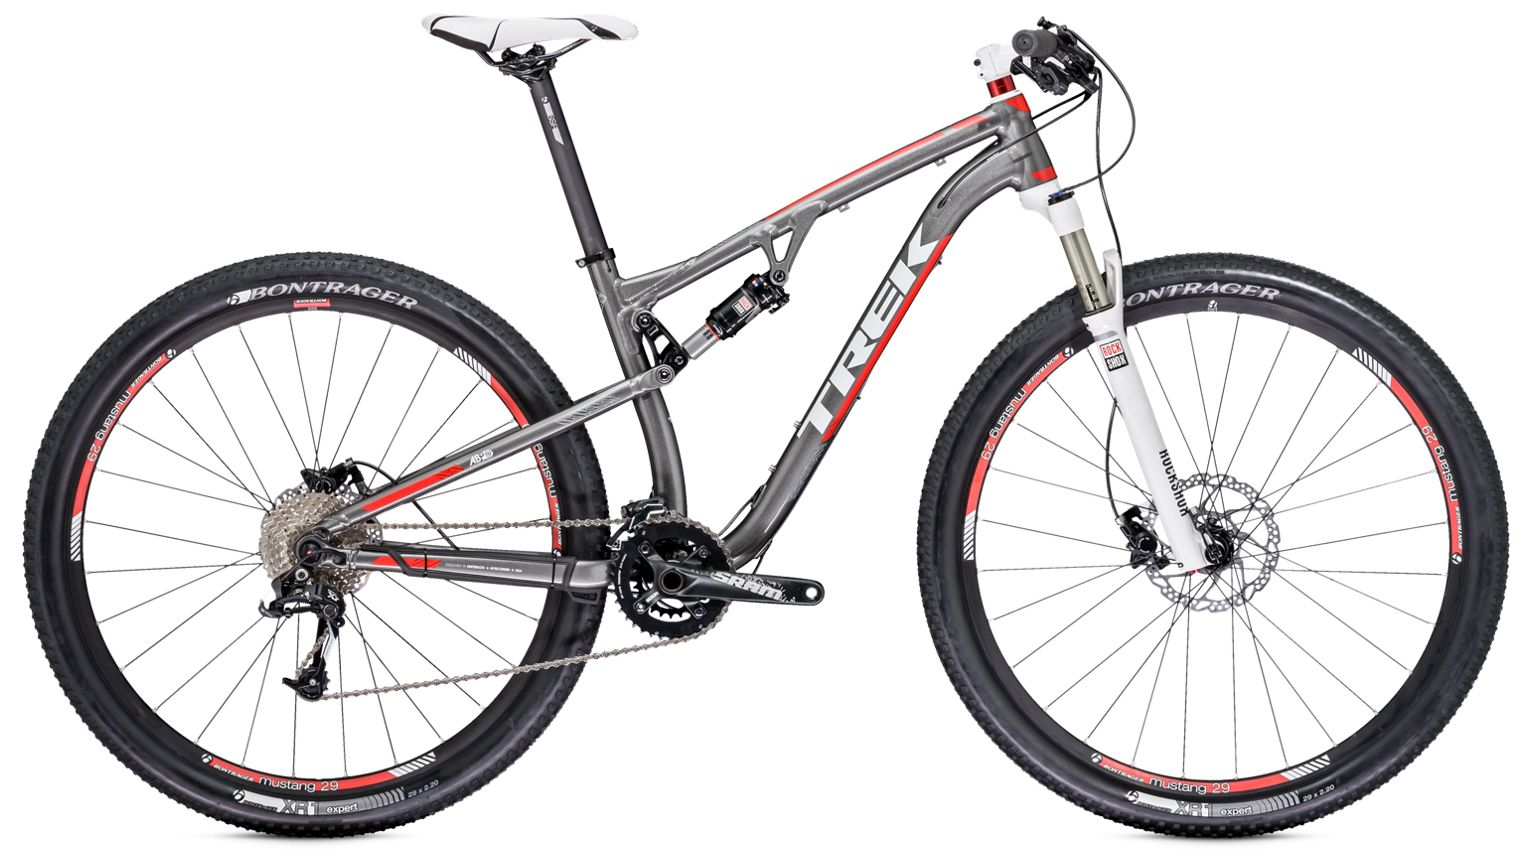 Велосипед Trek Superfly FS 7 2014,  Горные  - артикул:284042